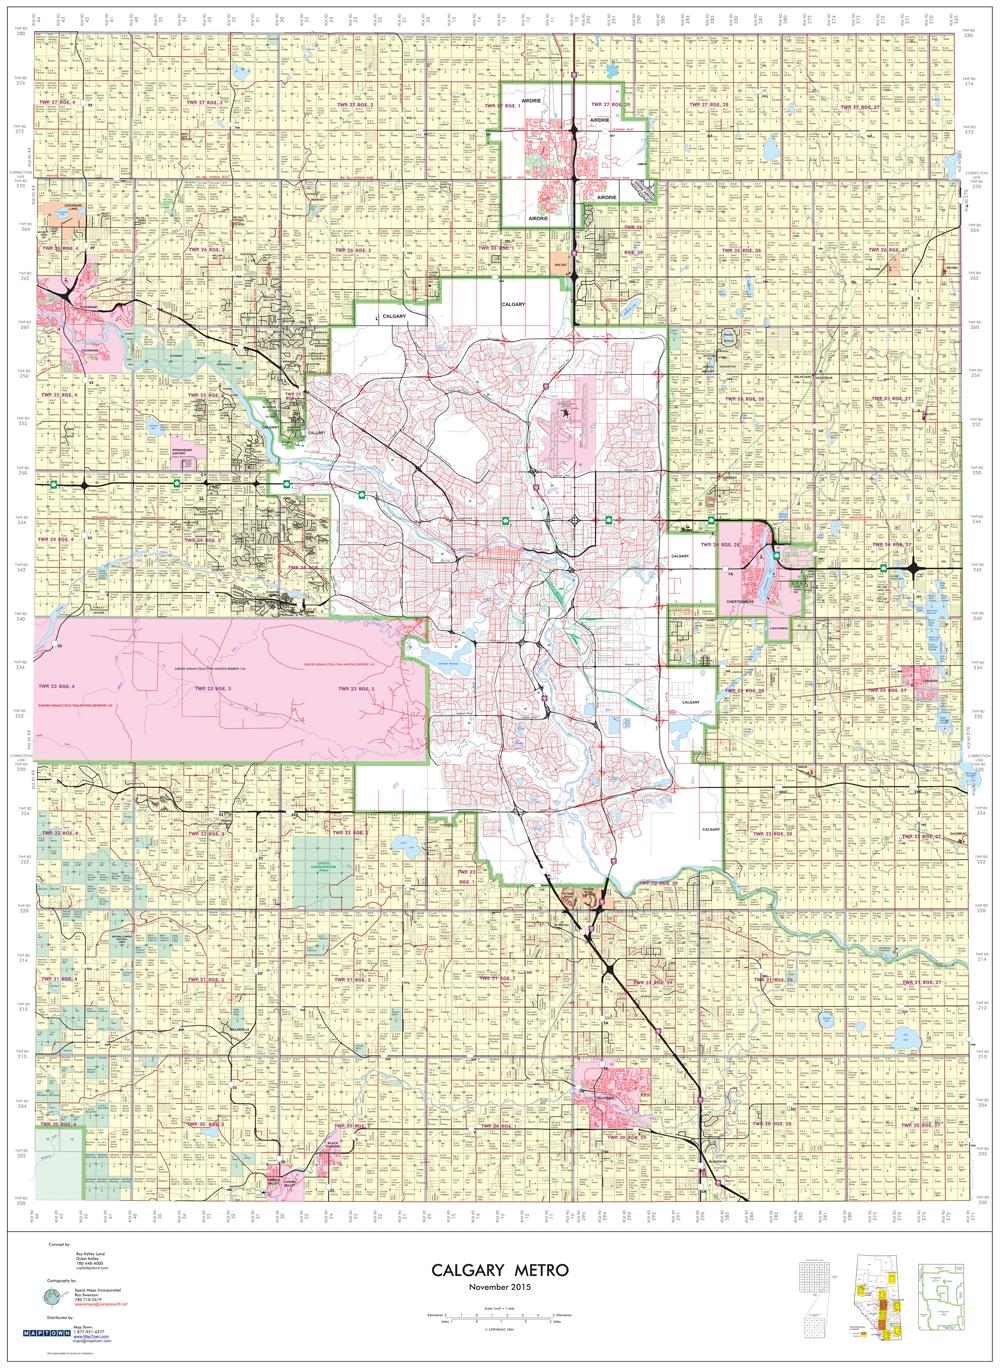 Calgary Metro Wall Map Roy Swenson